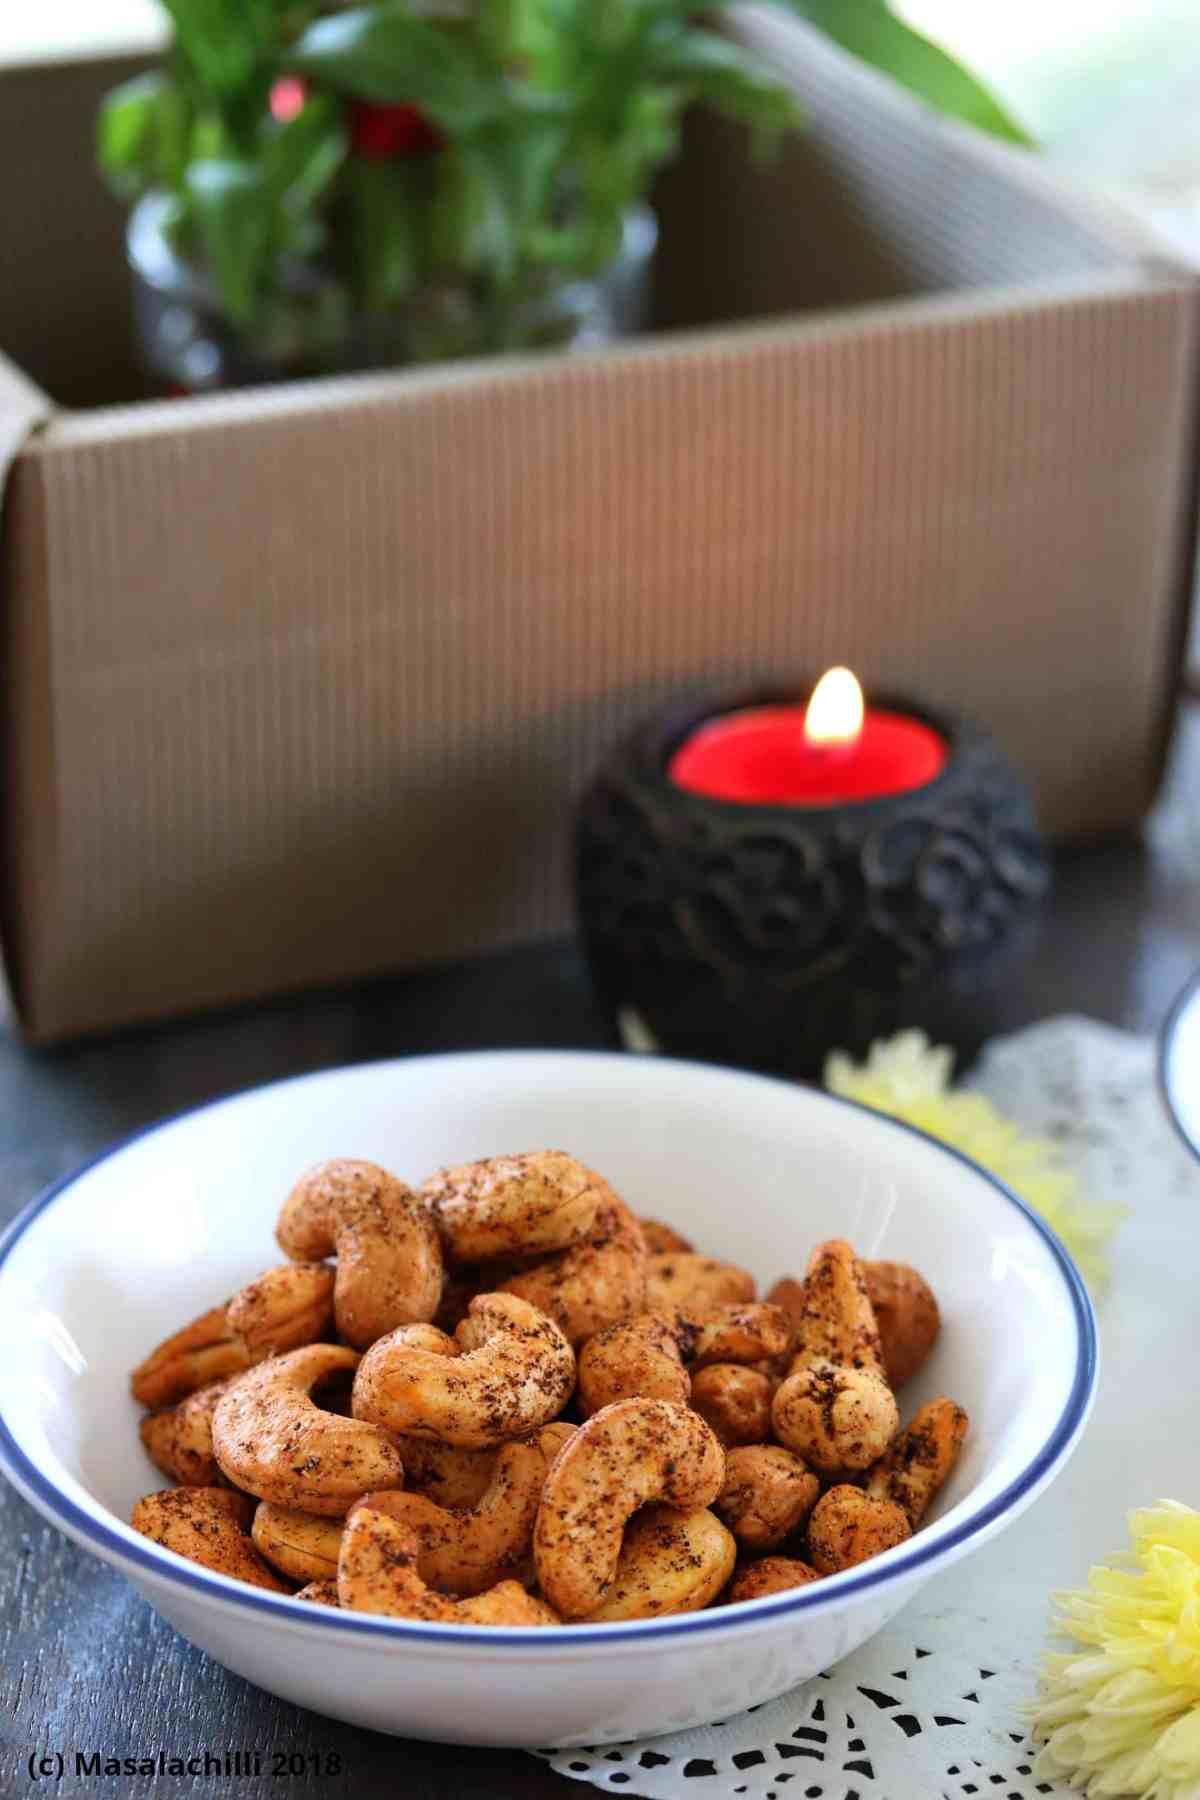 Air Fried Spicy Masala Kaju or Spicy Masala Cashew Nuts in Air Fryer